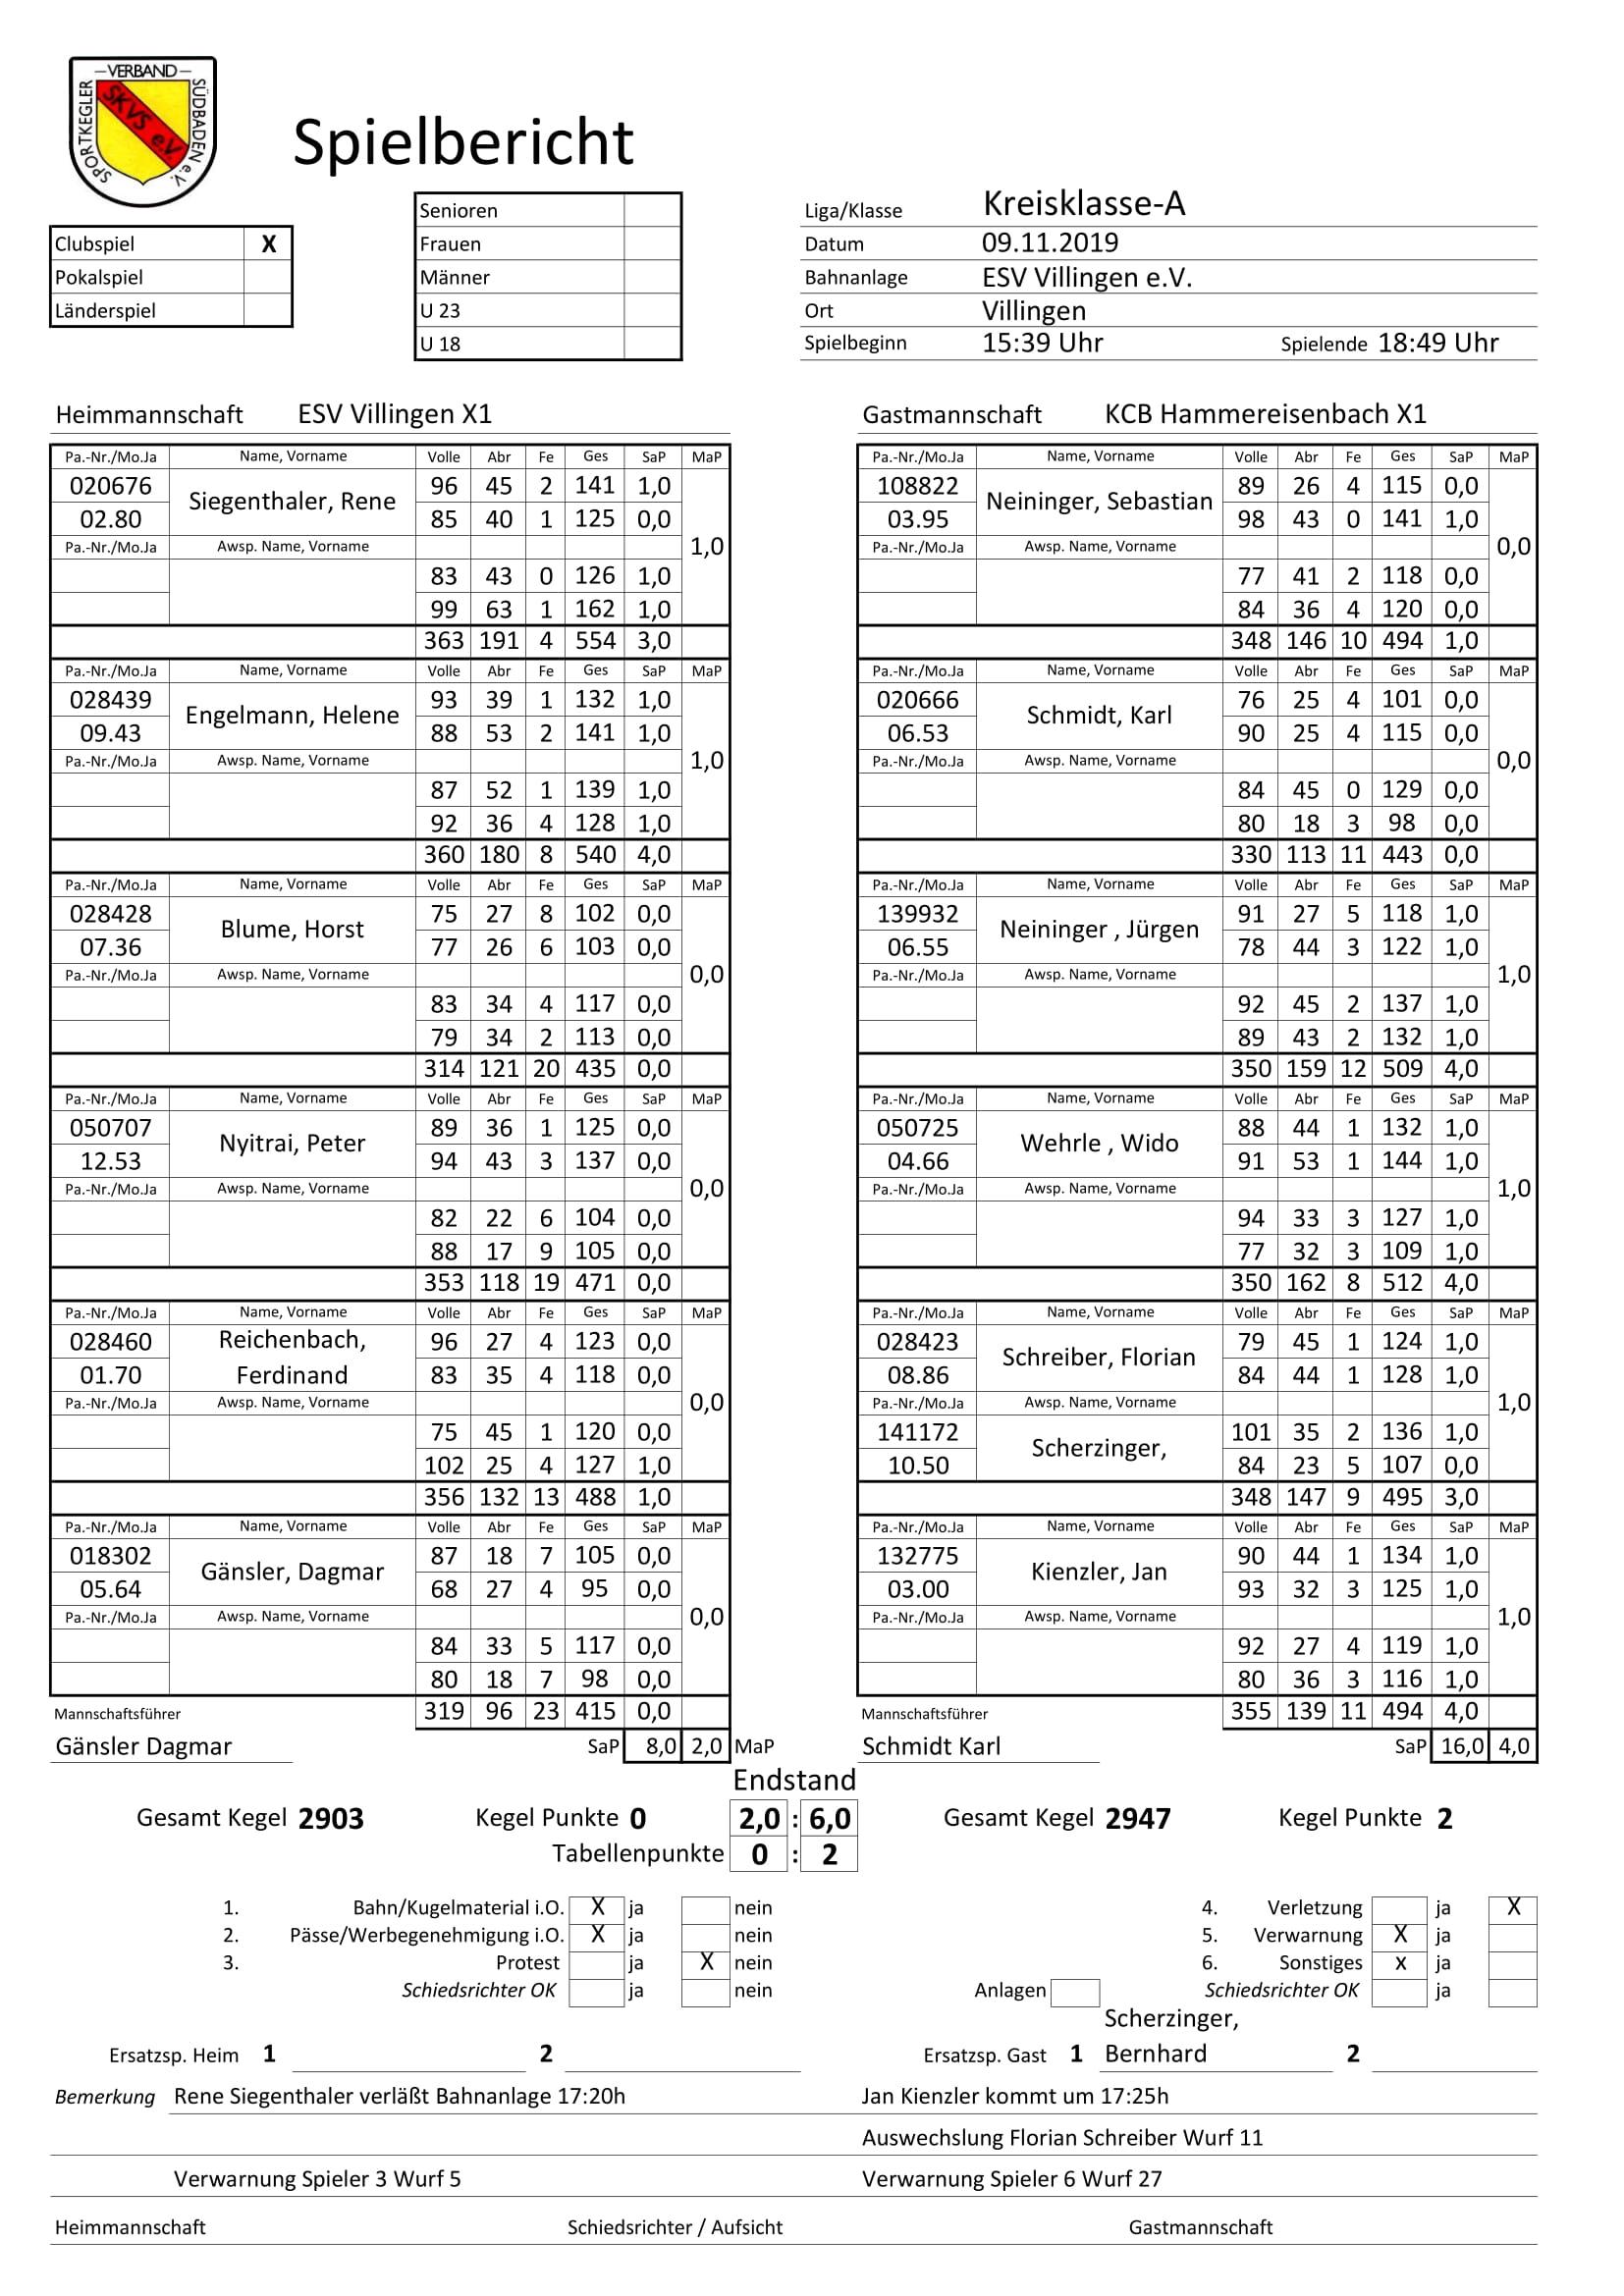 ESV Villingen X1 Gegen KCB Hammereisenbach X1